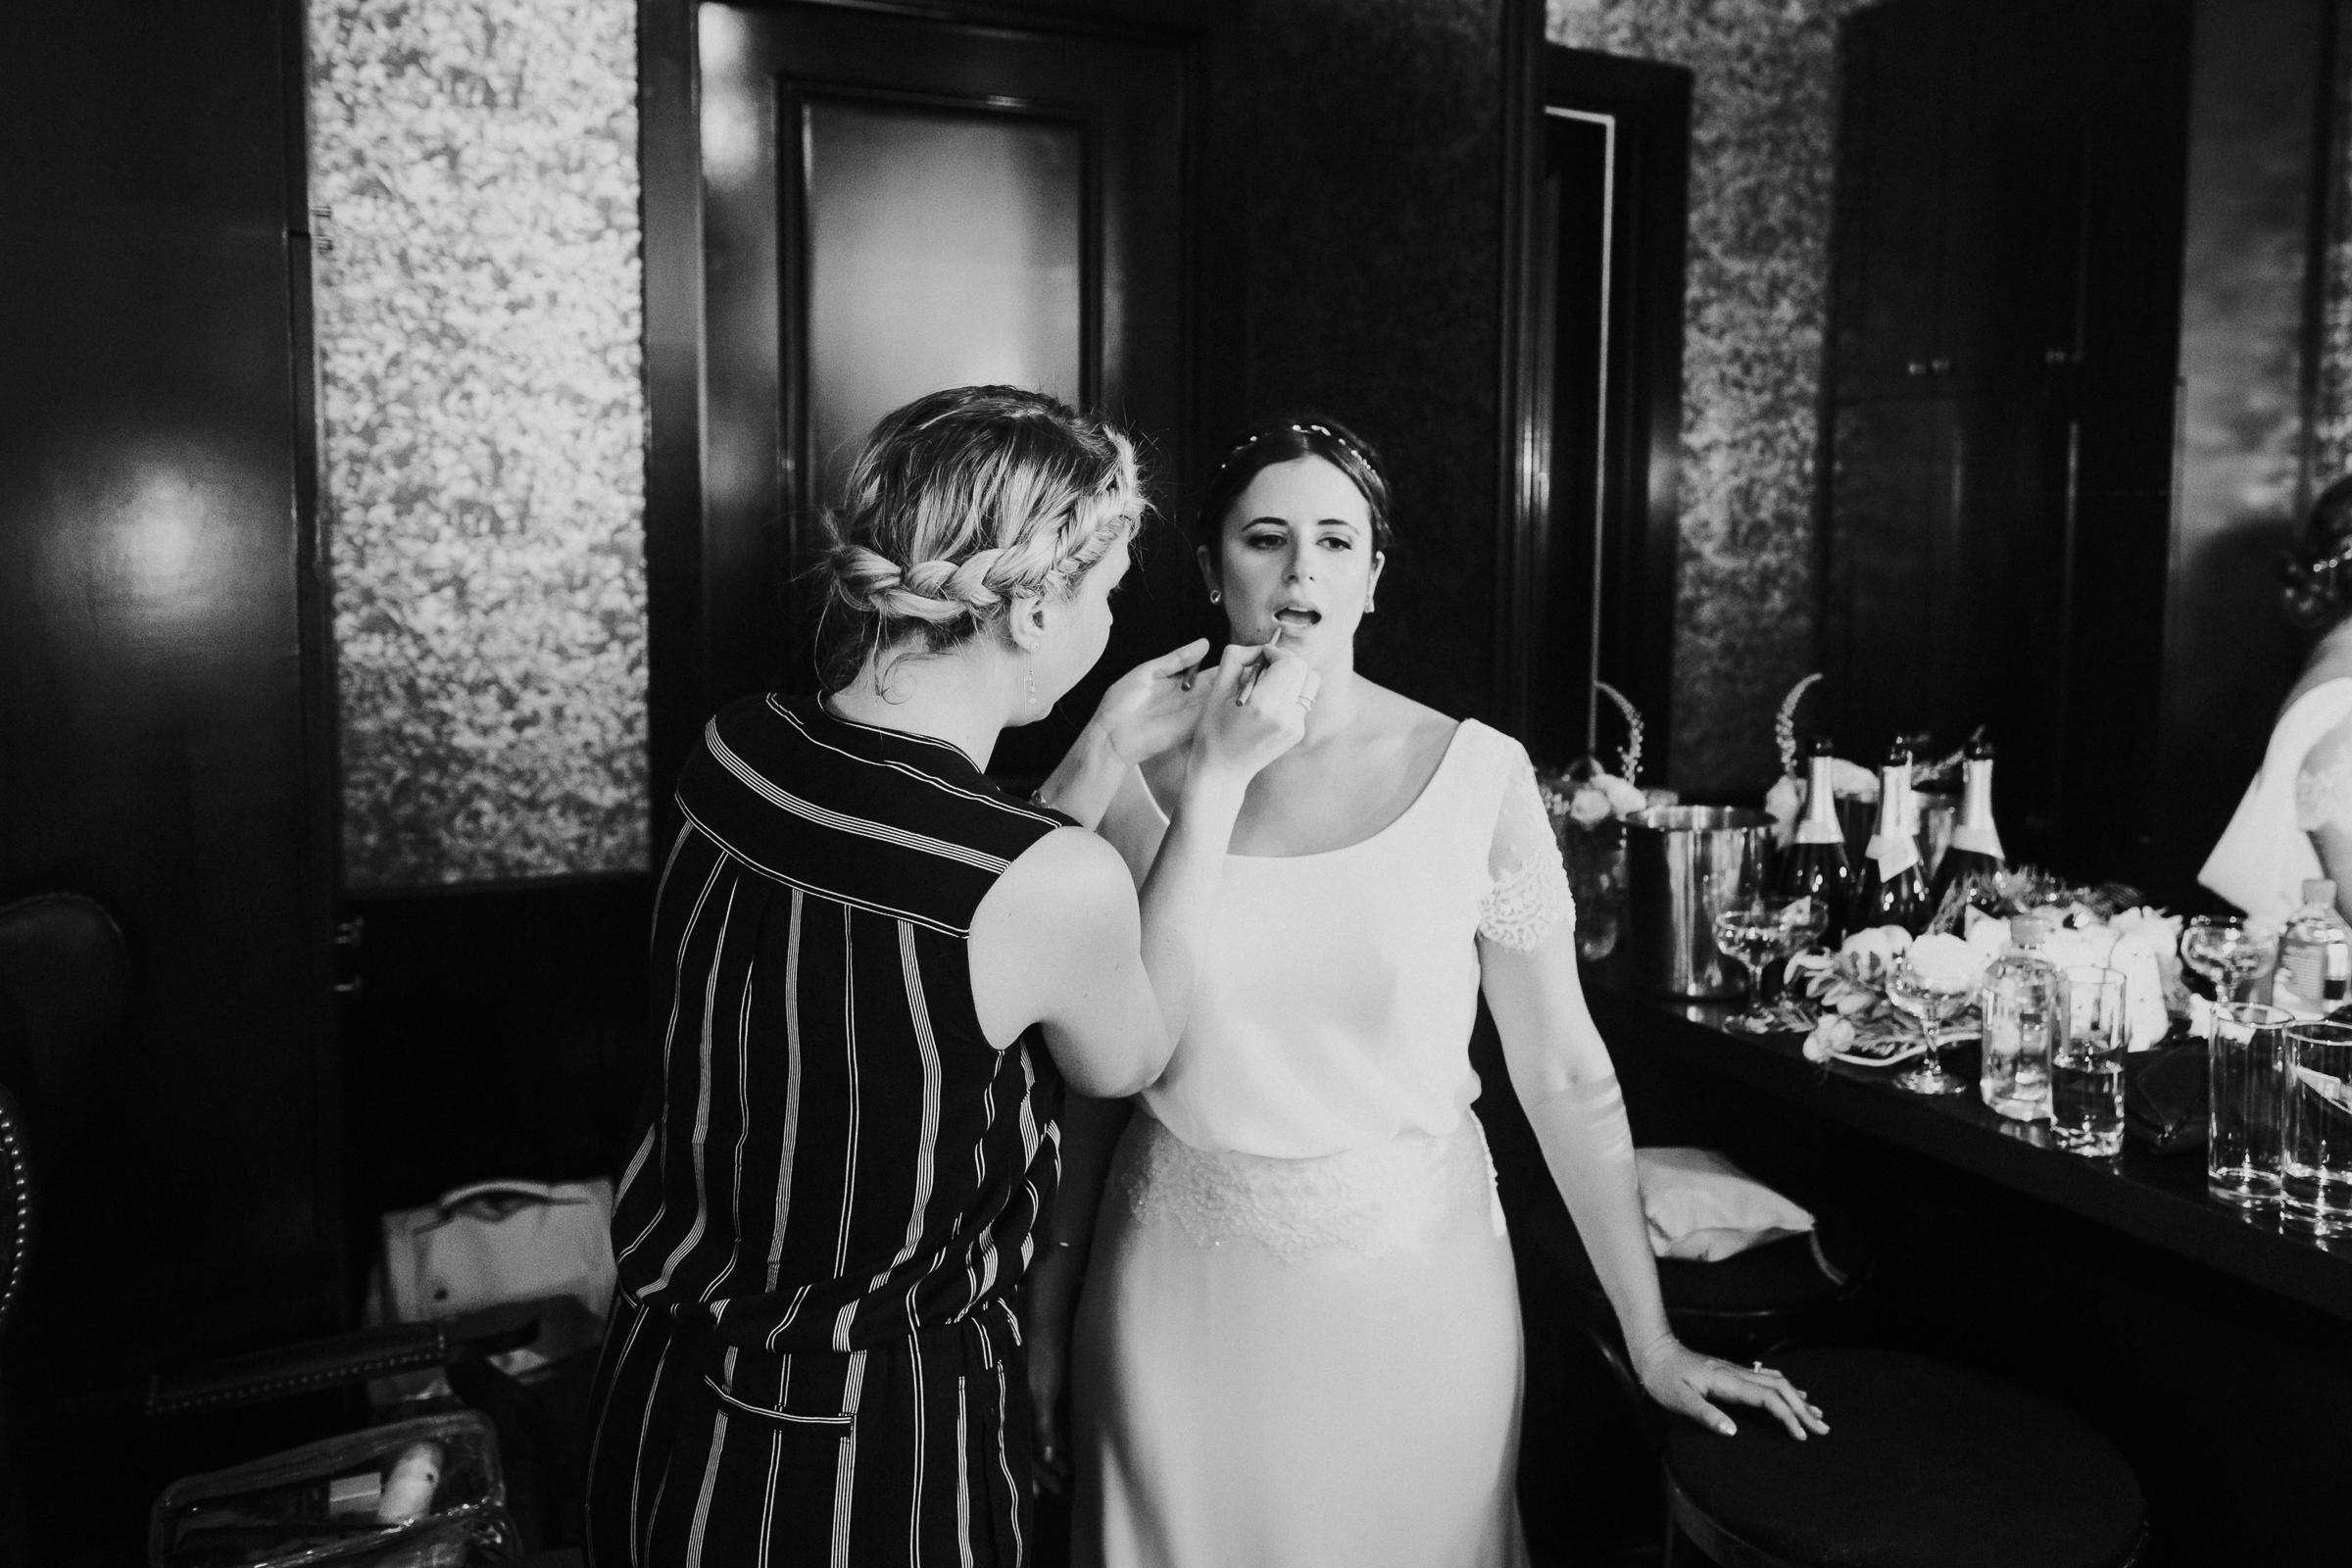 501-Union-Brooklyn-Fine-Art-Documentary-Wedding-Photographer-62.jpg